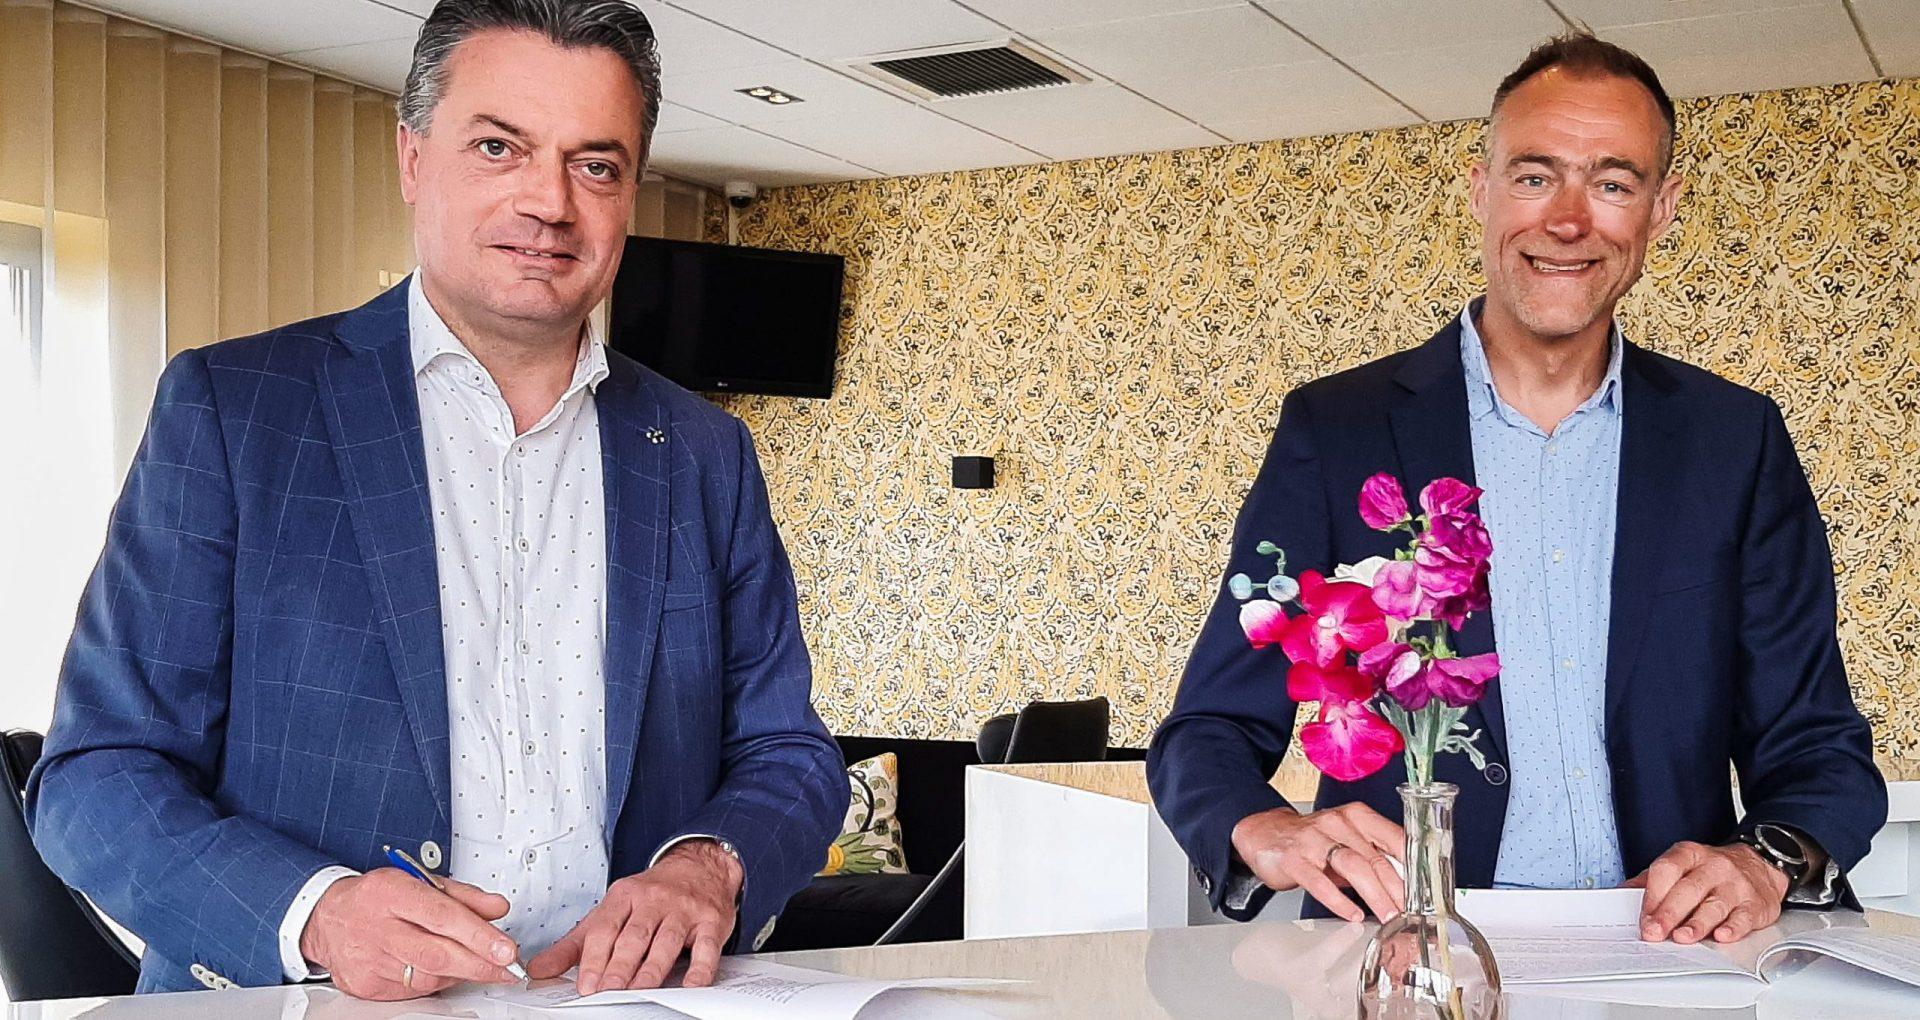 Links: Wim Kulik, rechts: Gerwin Kamps